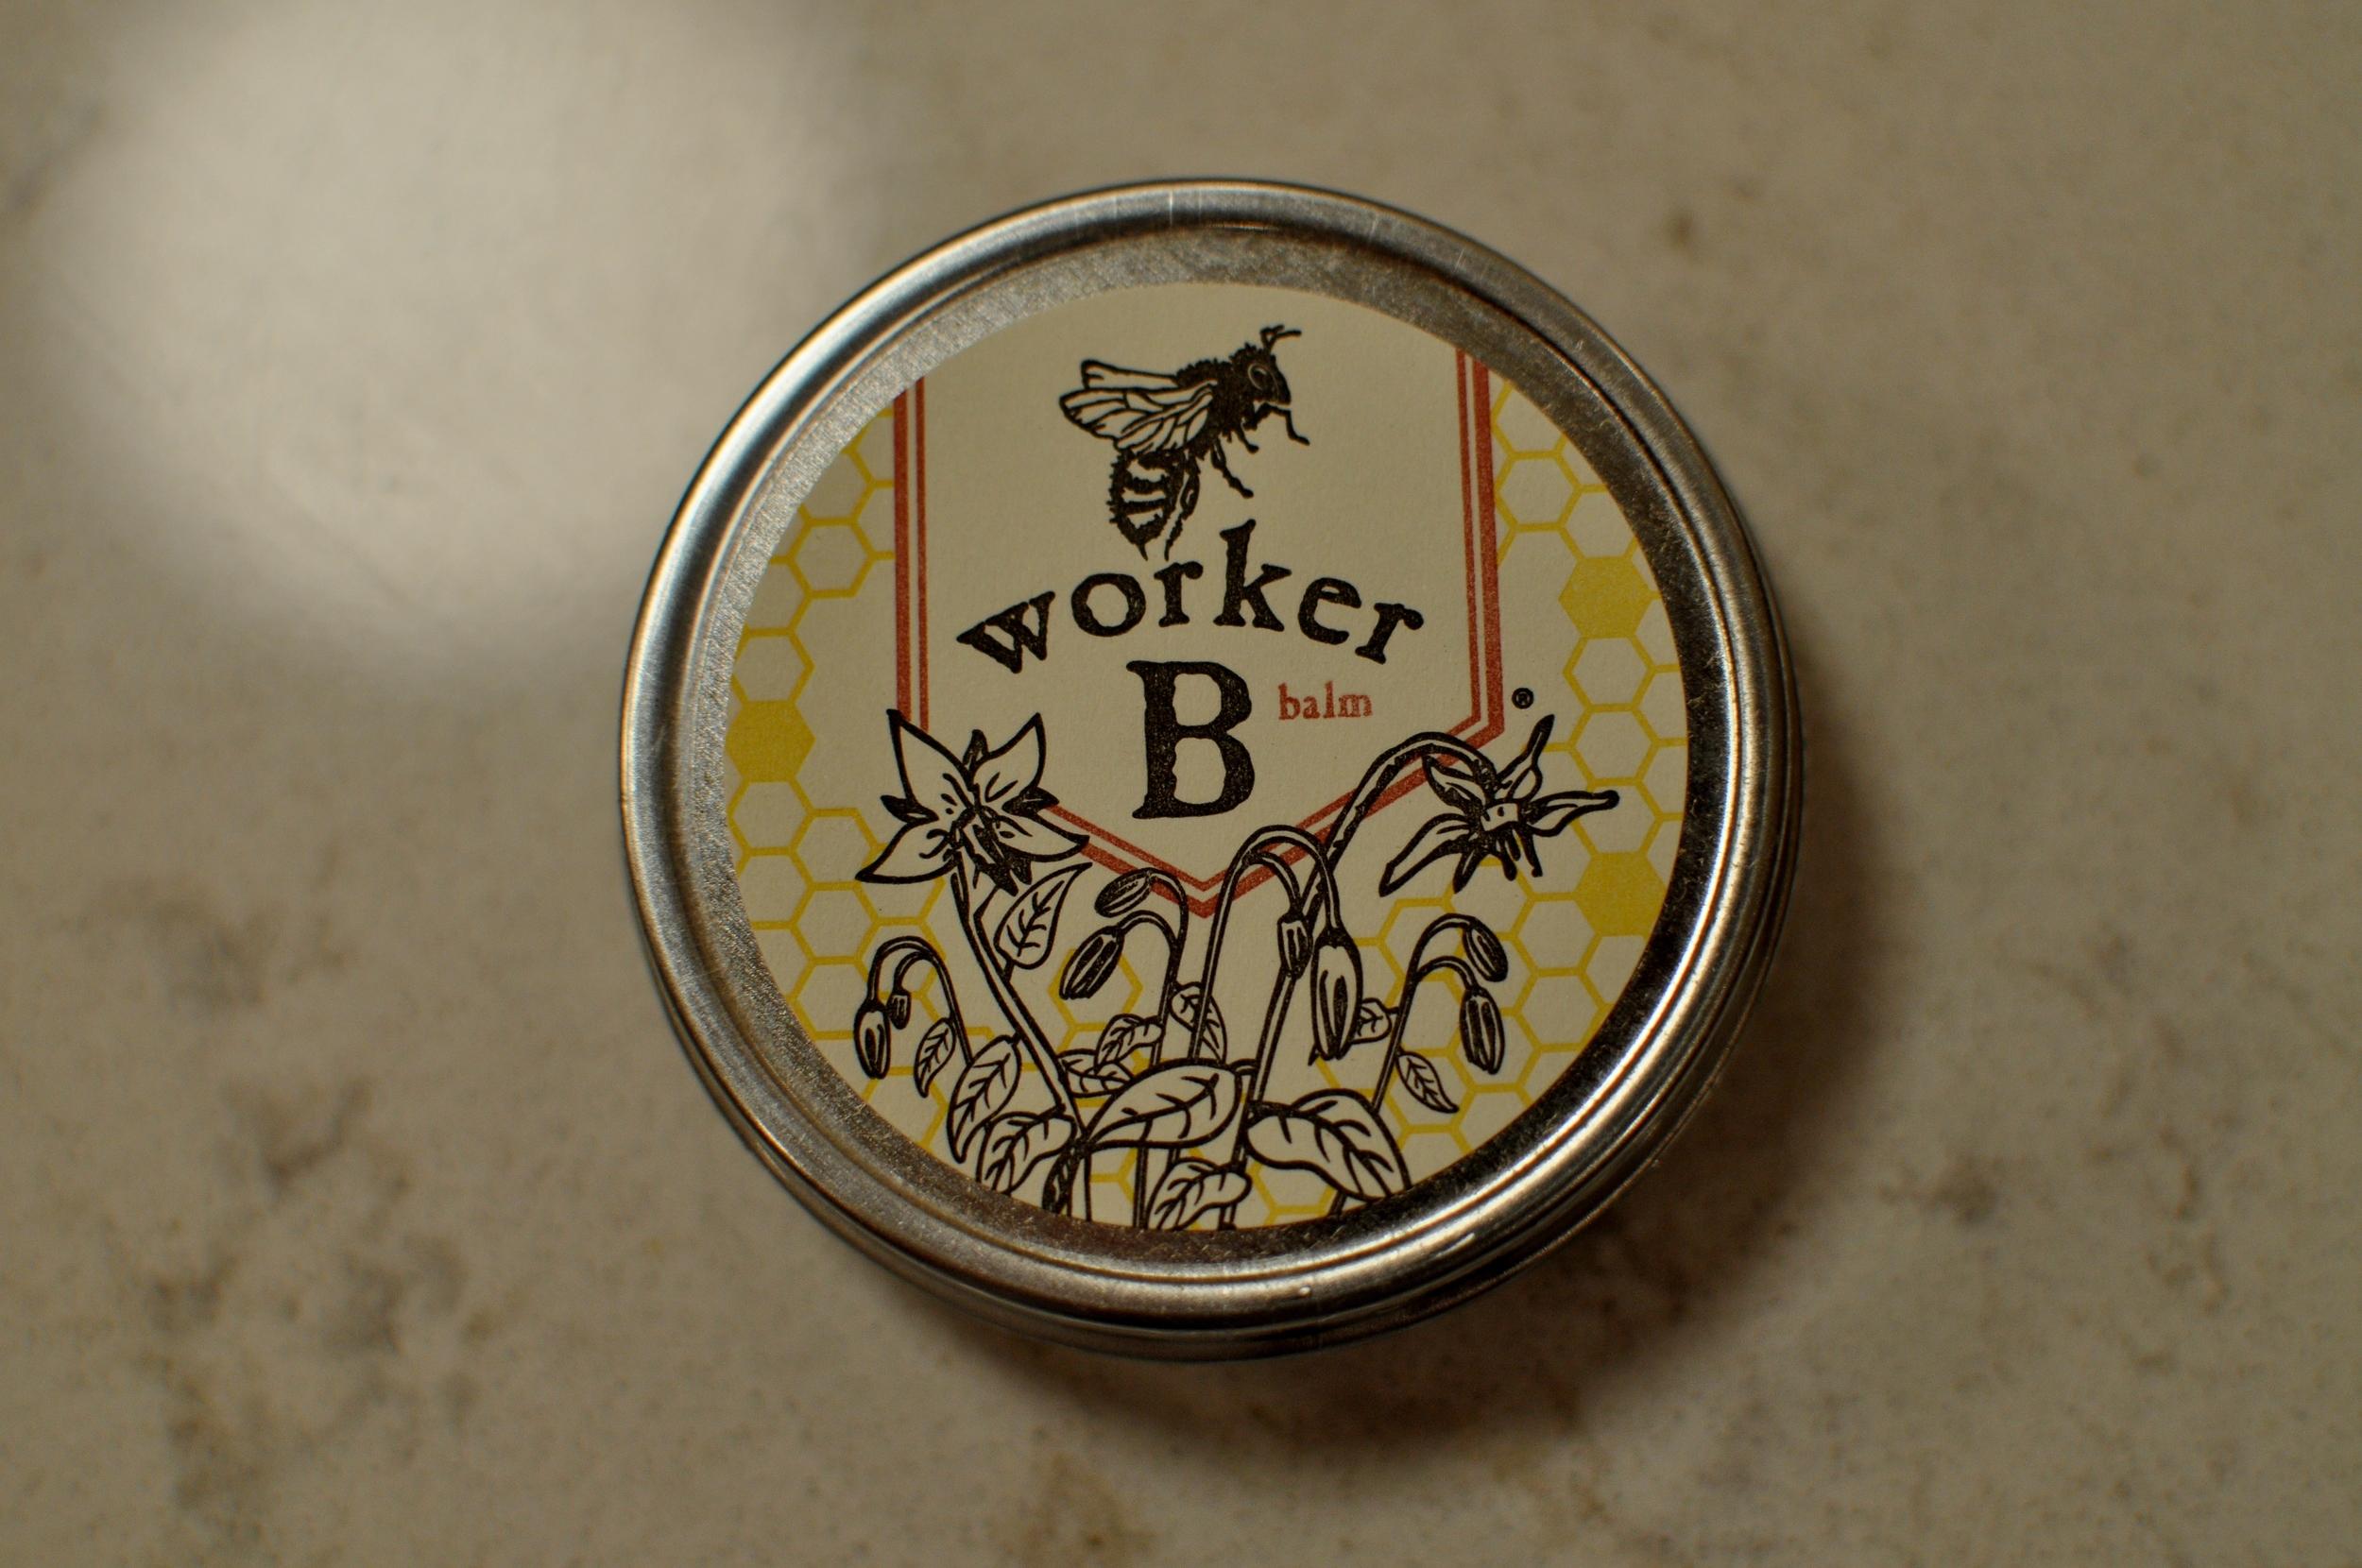 Worker B Balm